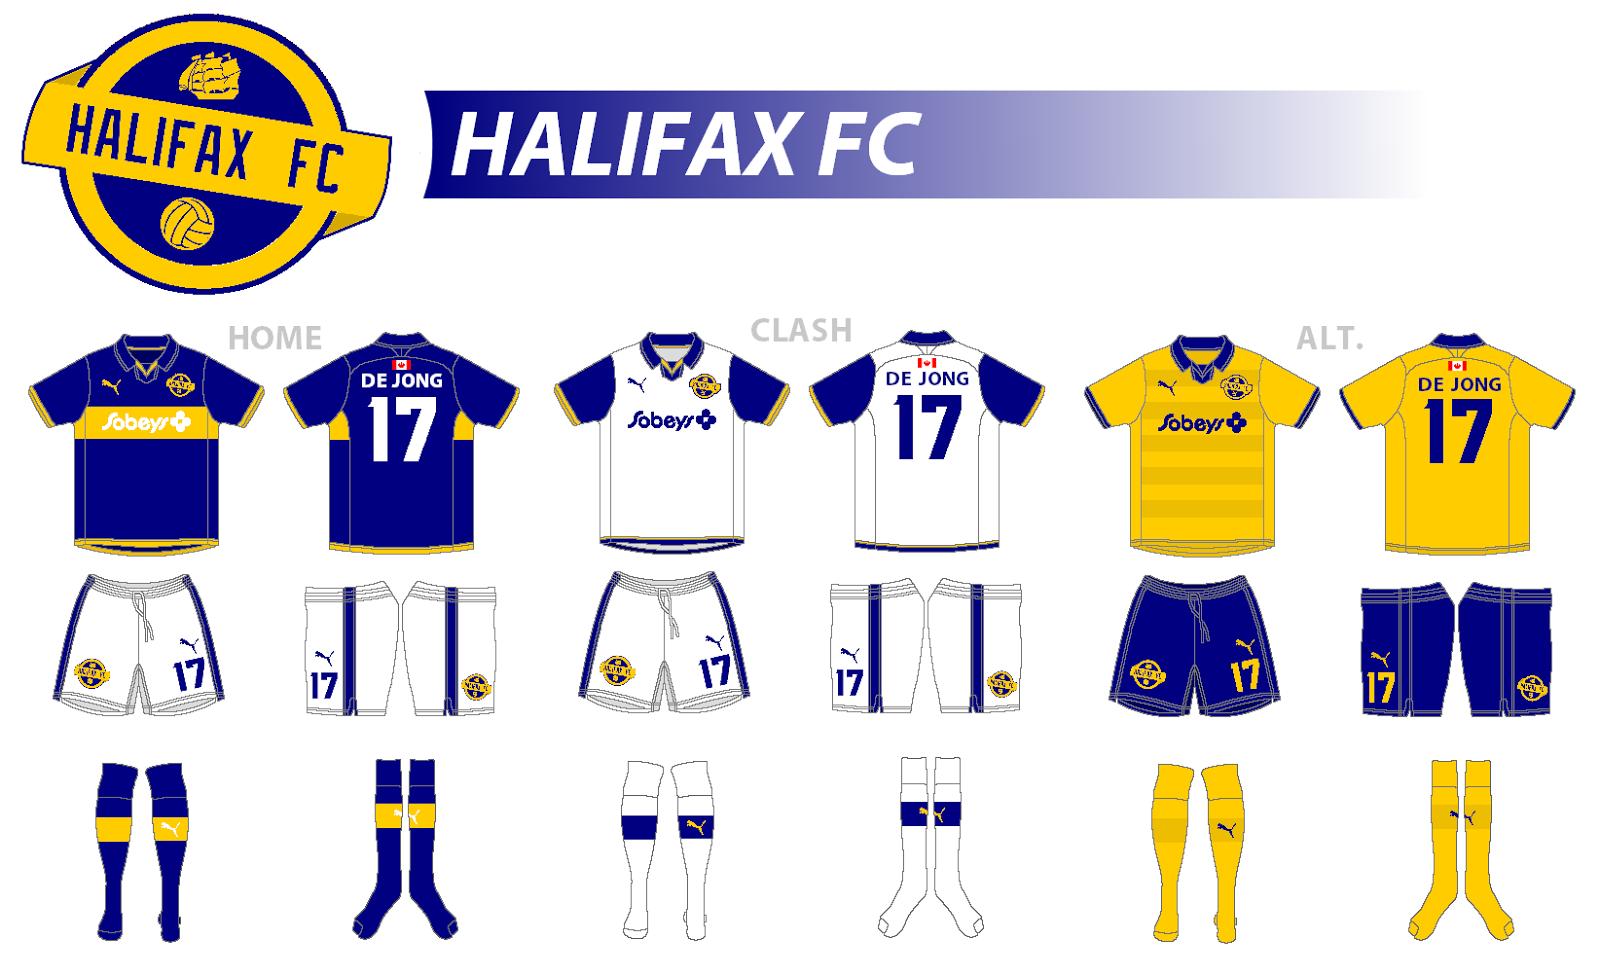 halifax+fc.png